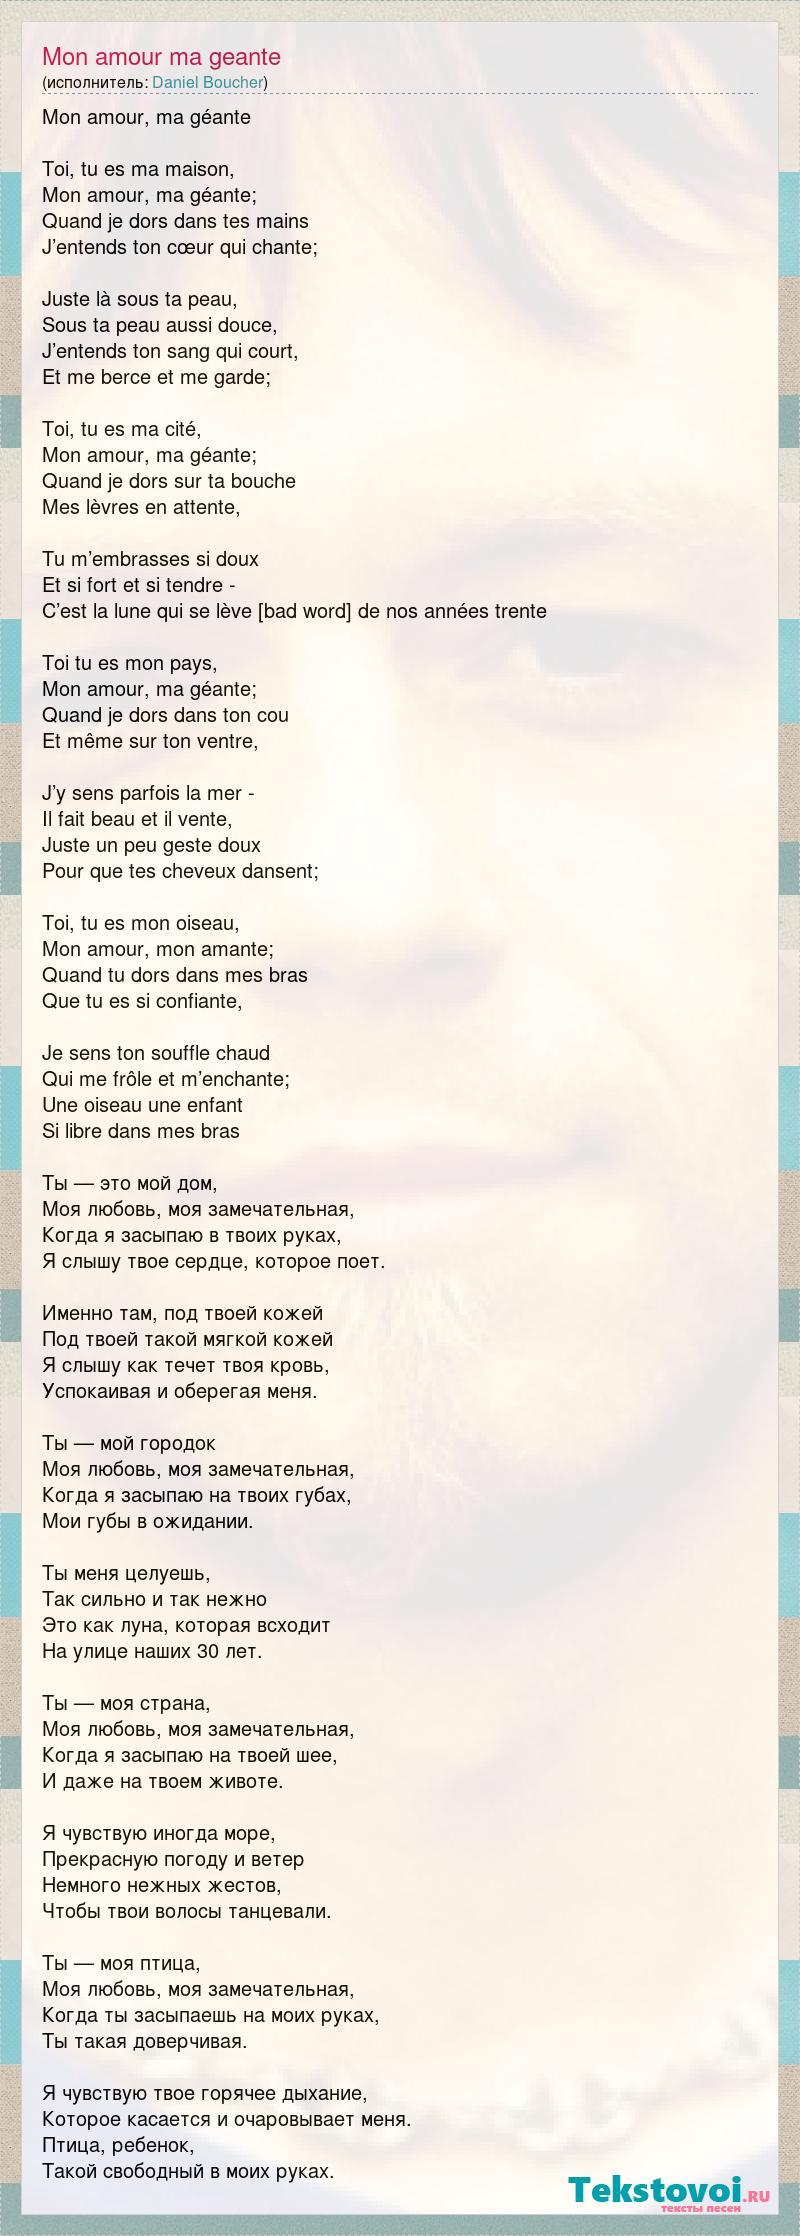 Daniel Boucher Mon Amour Ma Geante слова песни